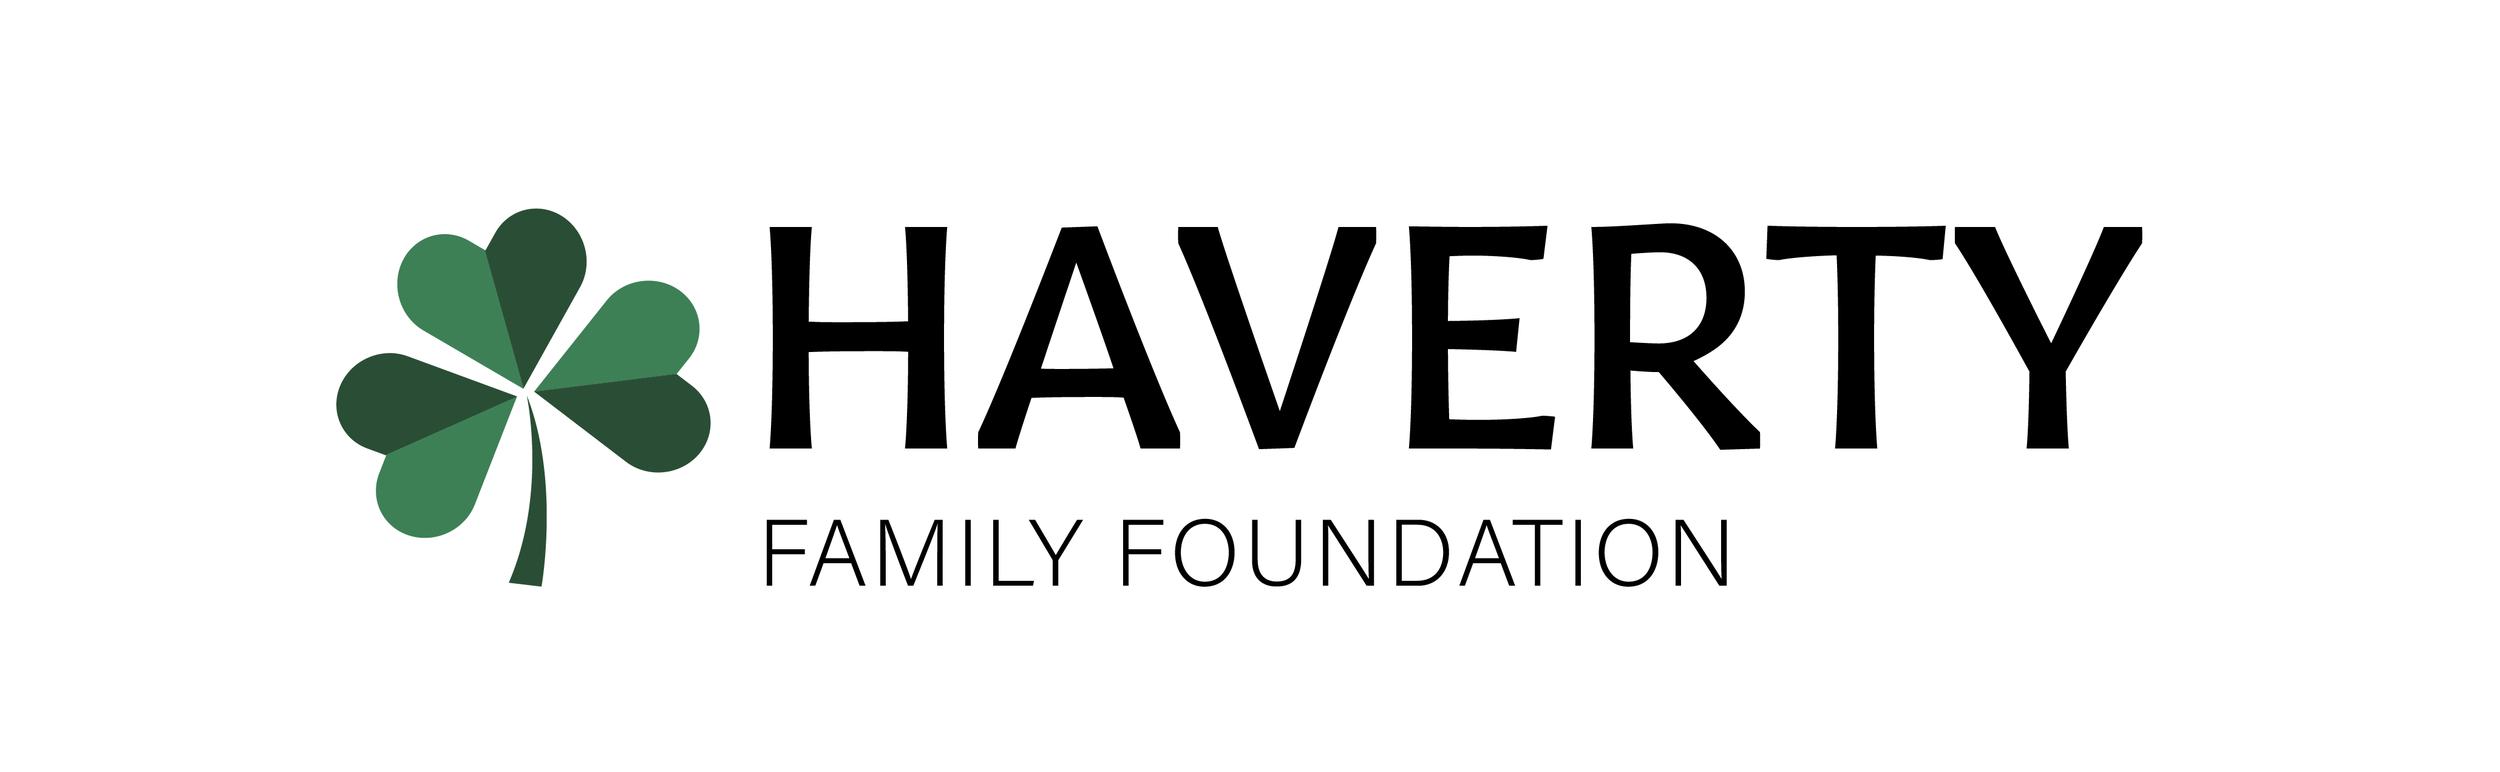 Haverty logo-05.png